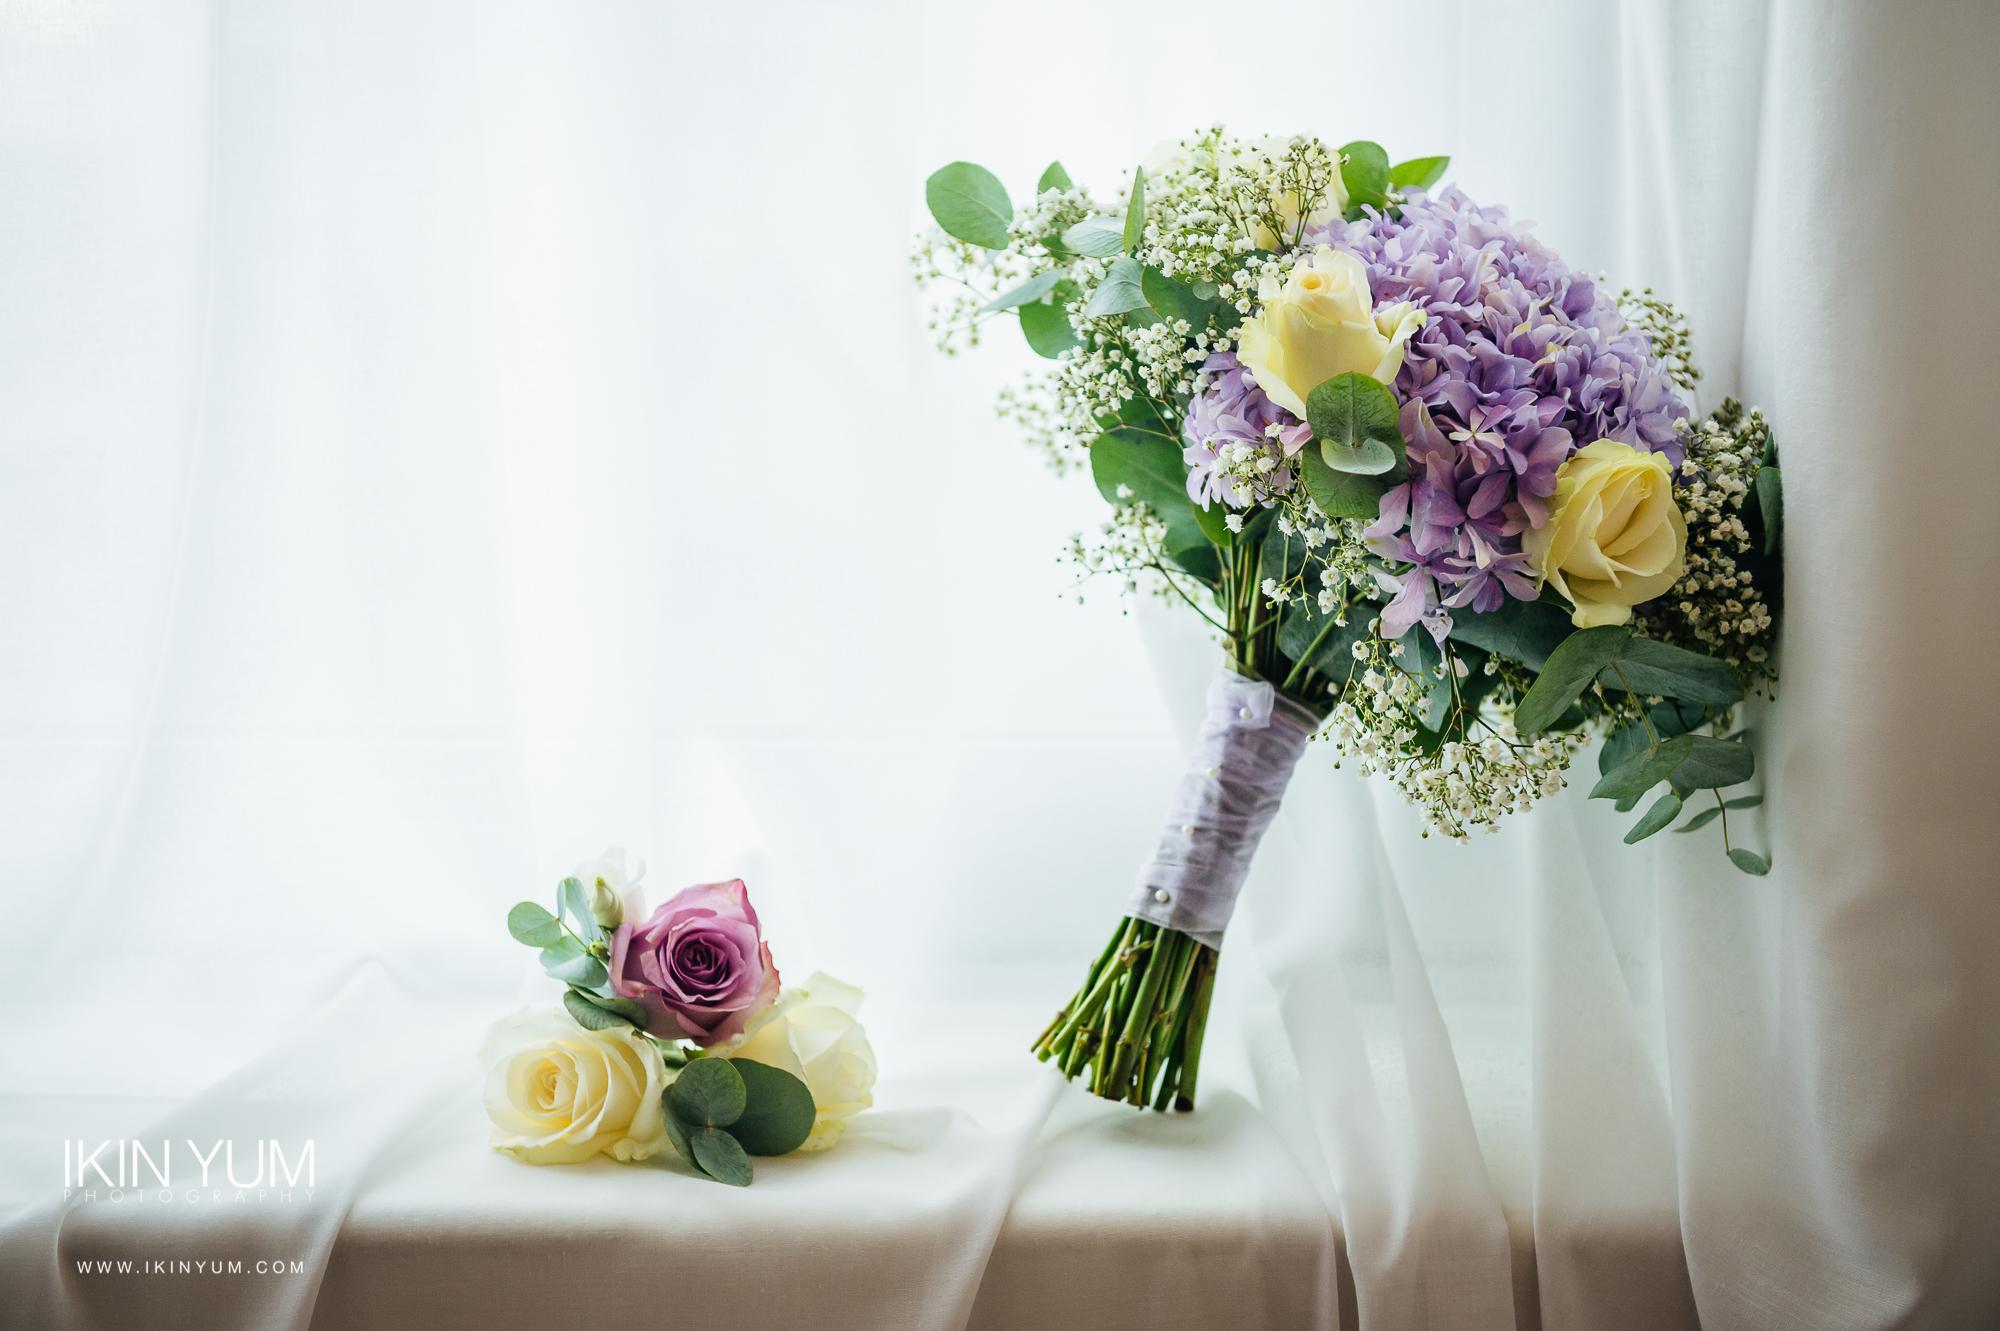 Syon Park Wedding - Ikin Yum Photography -026.jpg